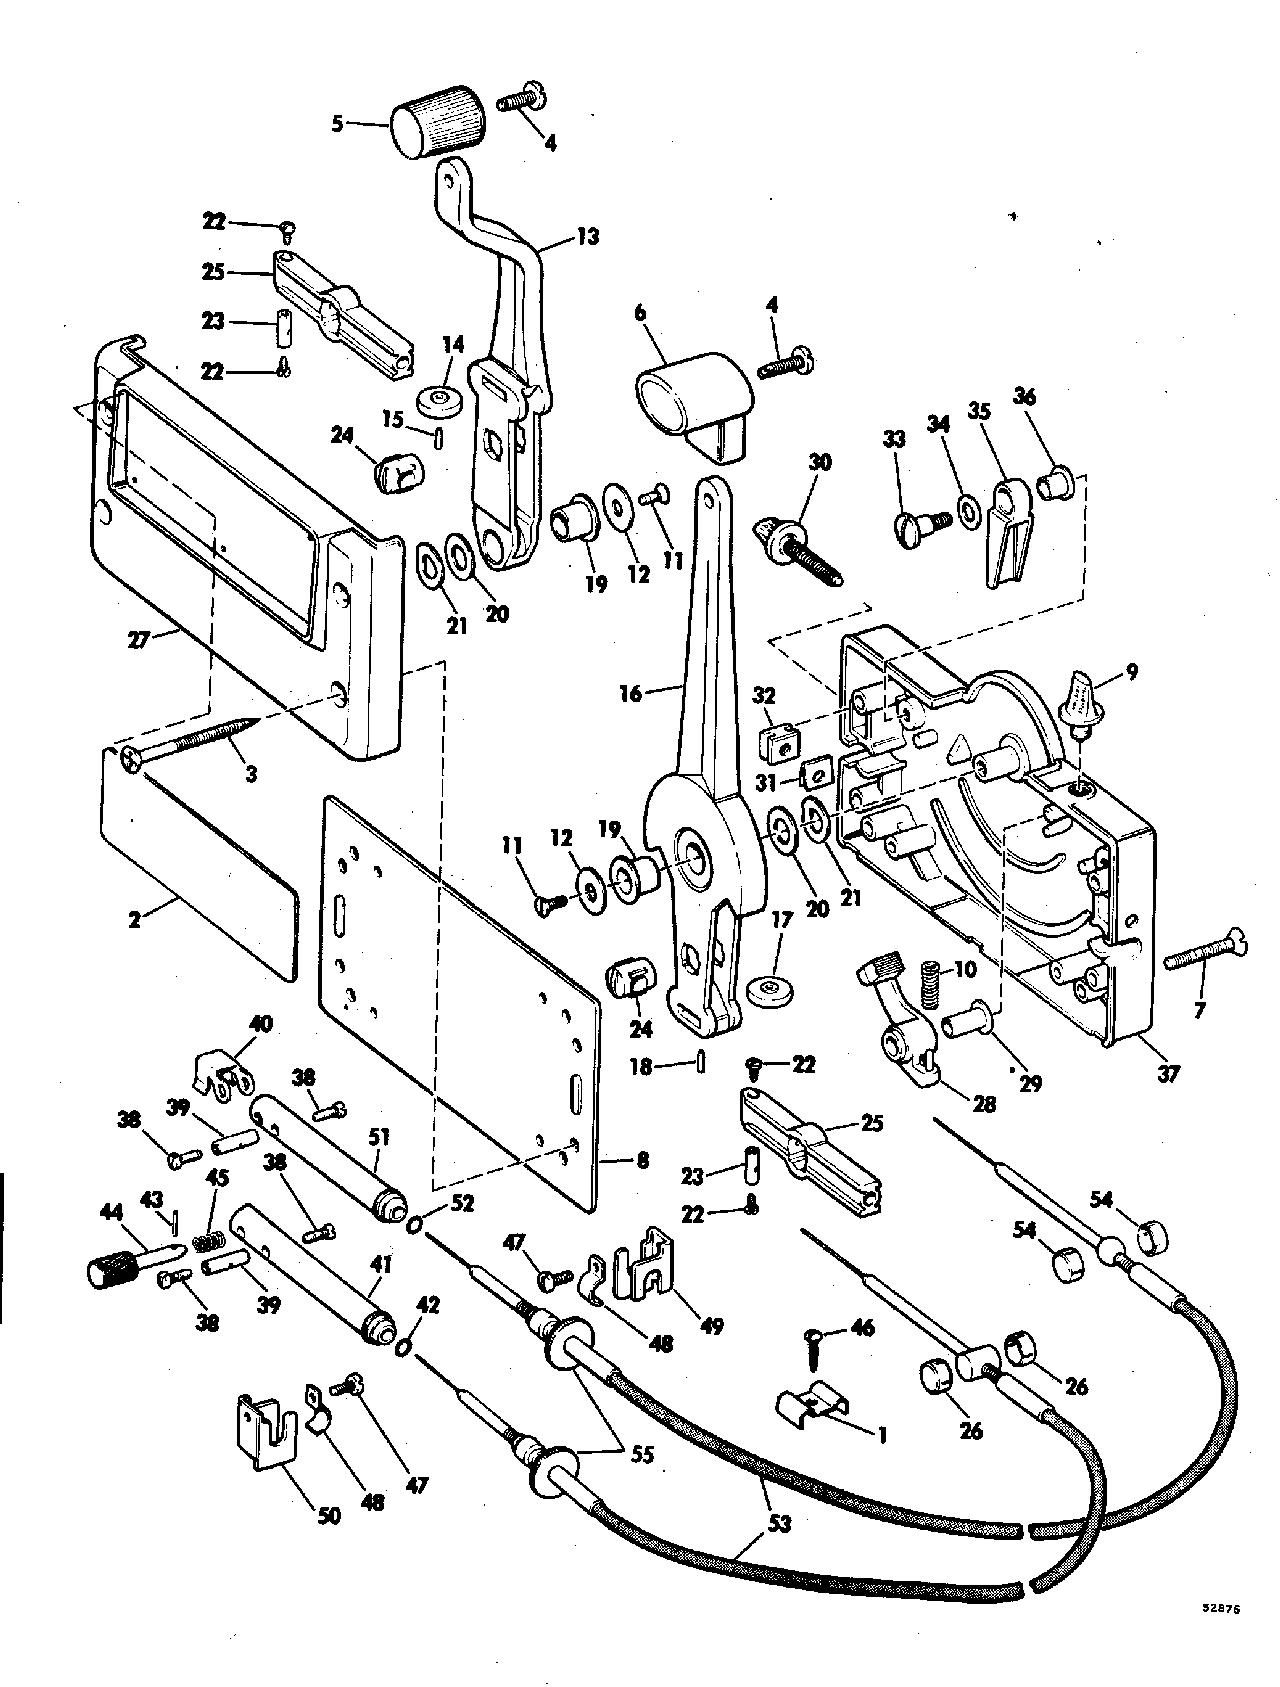 Remote Control Single Motor Remote Control